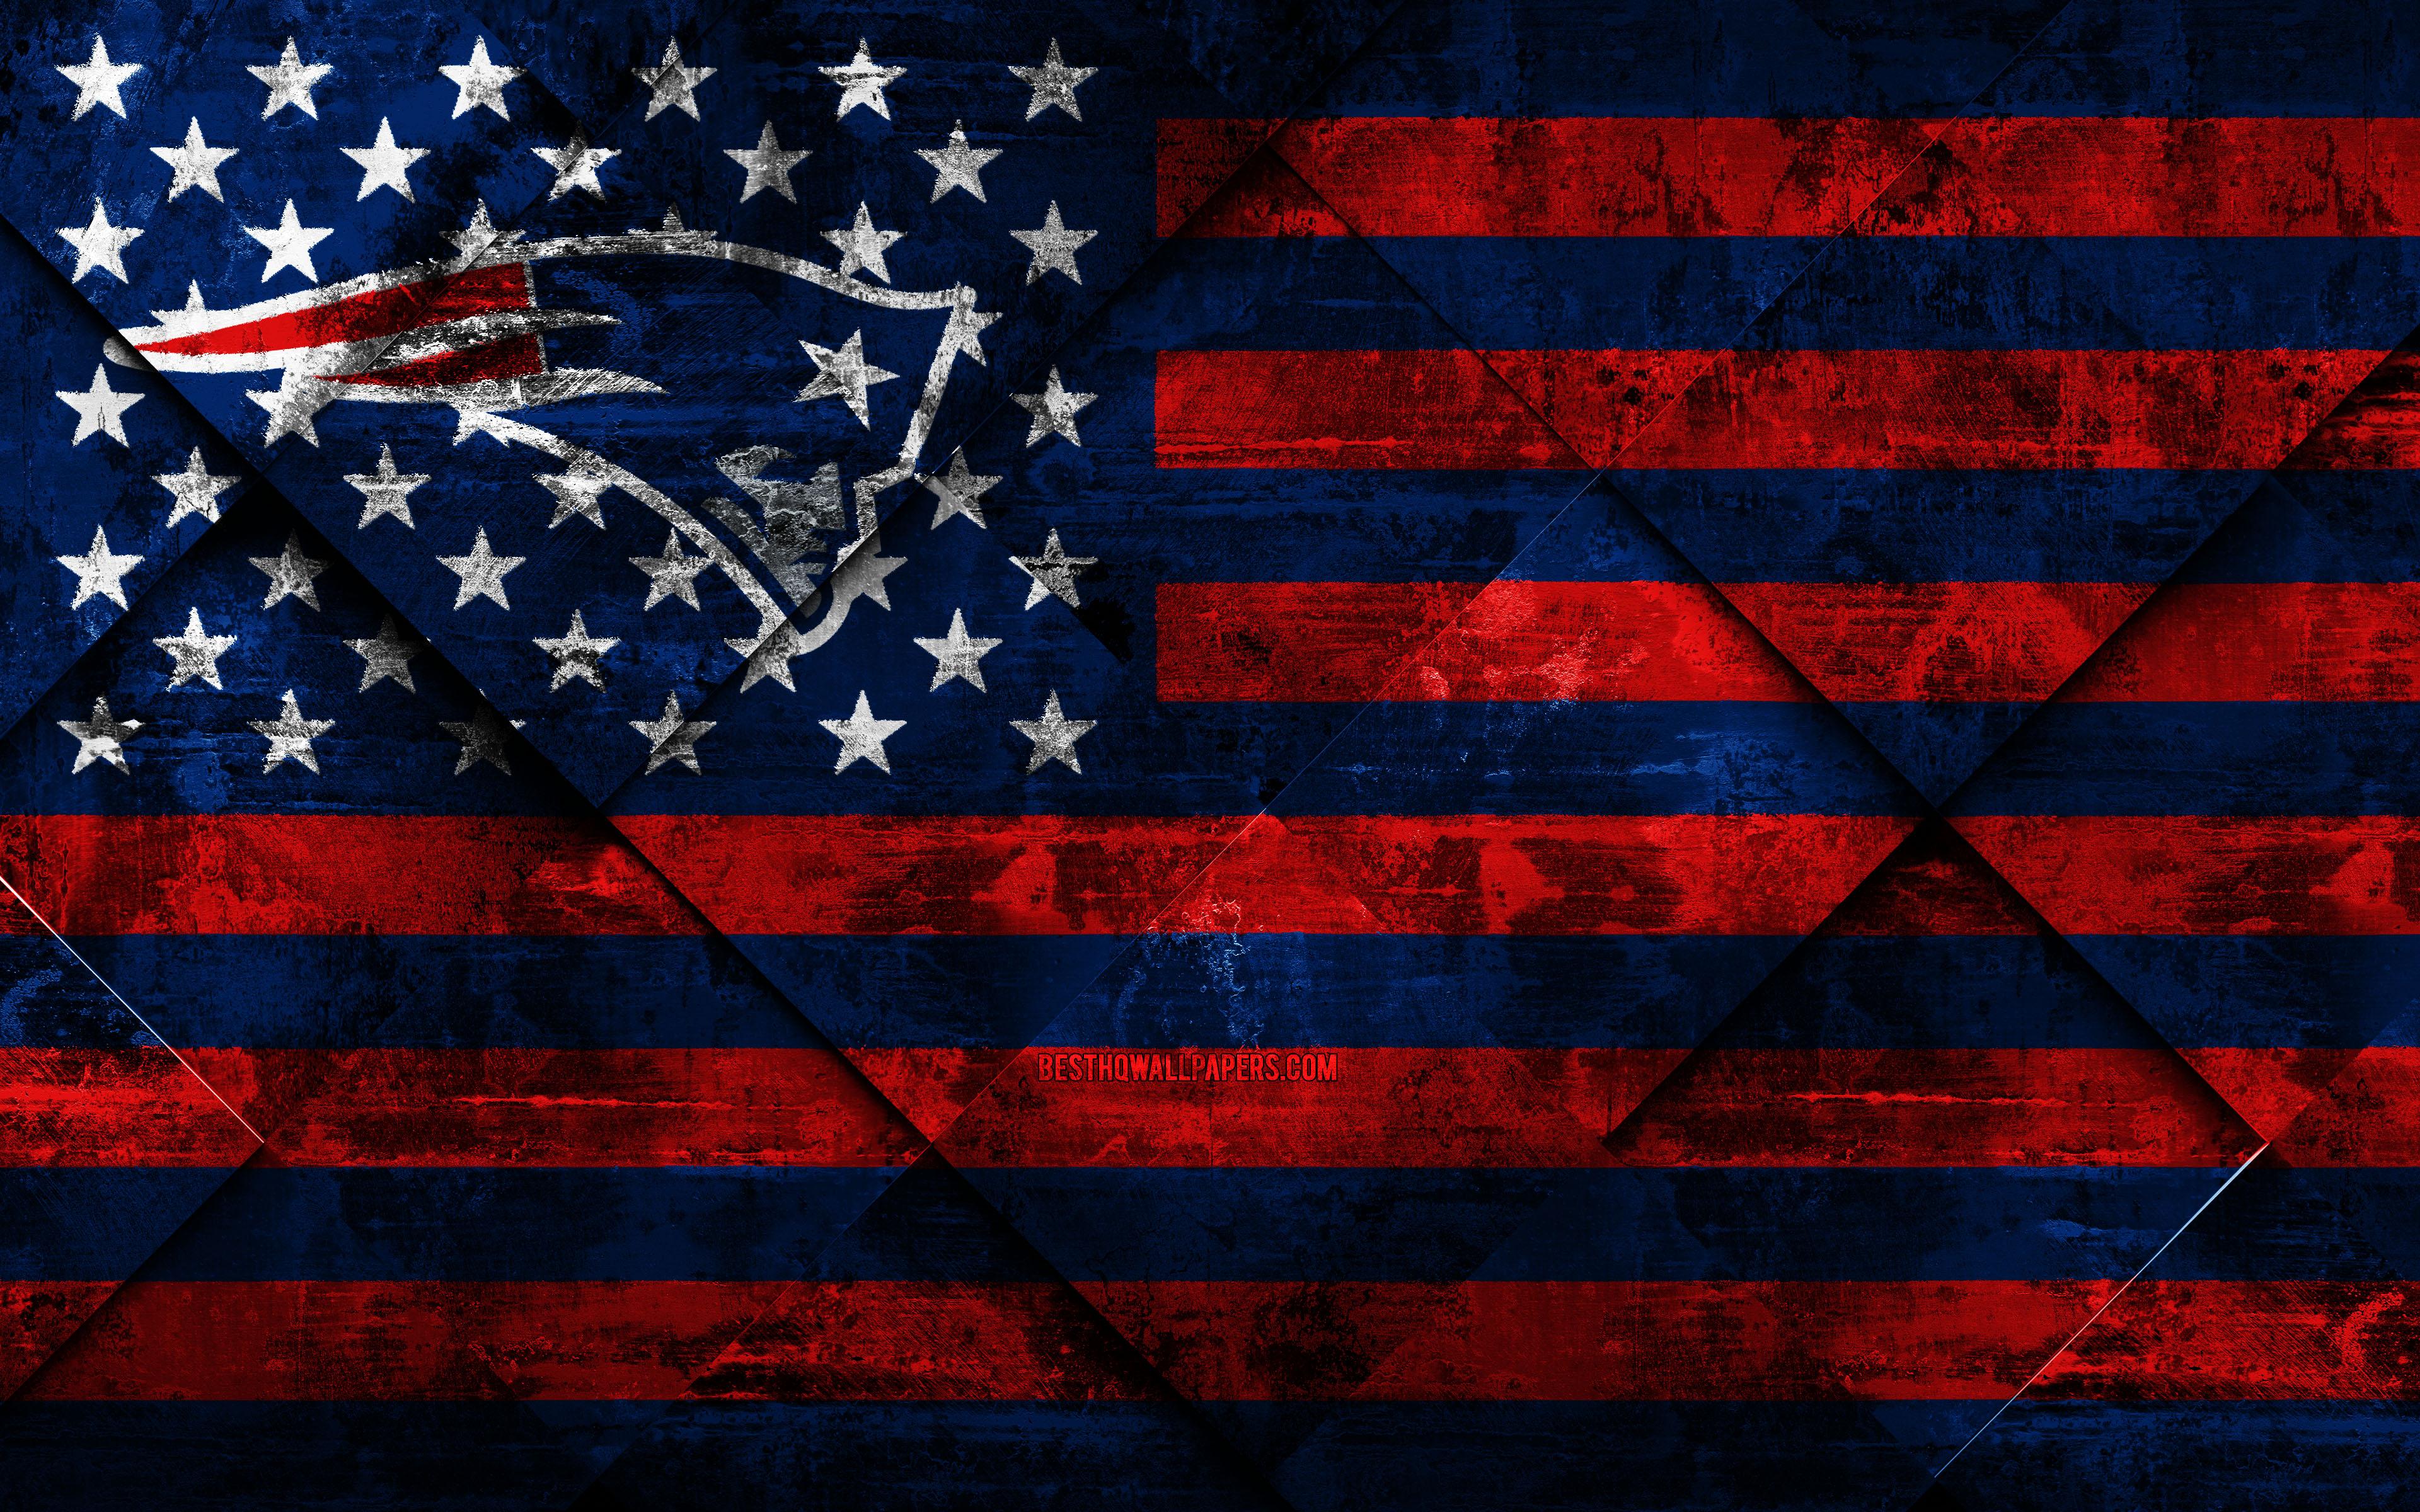 New England Patriots 4k American Football Club Grunge Braves American Flag 3840x2400 Download Hd Wallpaper Wallpapertip